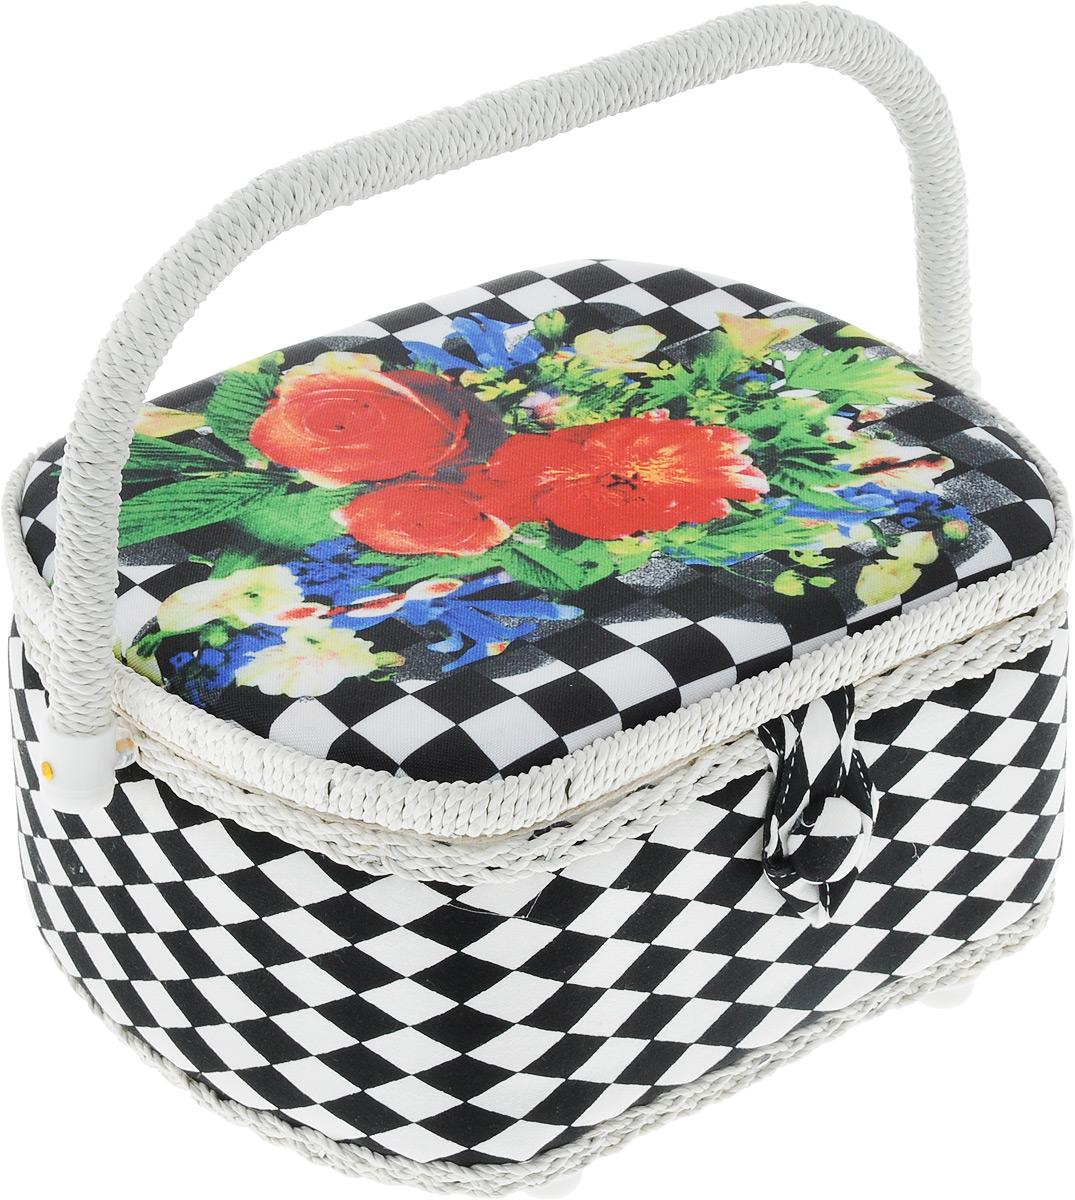 Шкатулка для рукоделия Bestex Букет, 23 х 18,5 х 13 см шкатулка для рукоделия bestex цветы 23 х 18 х 12 см